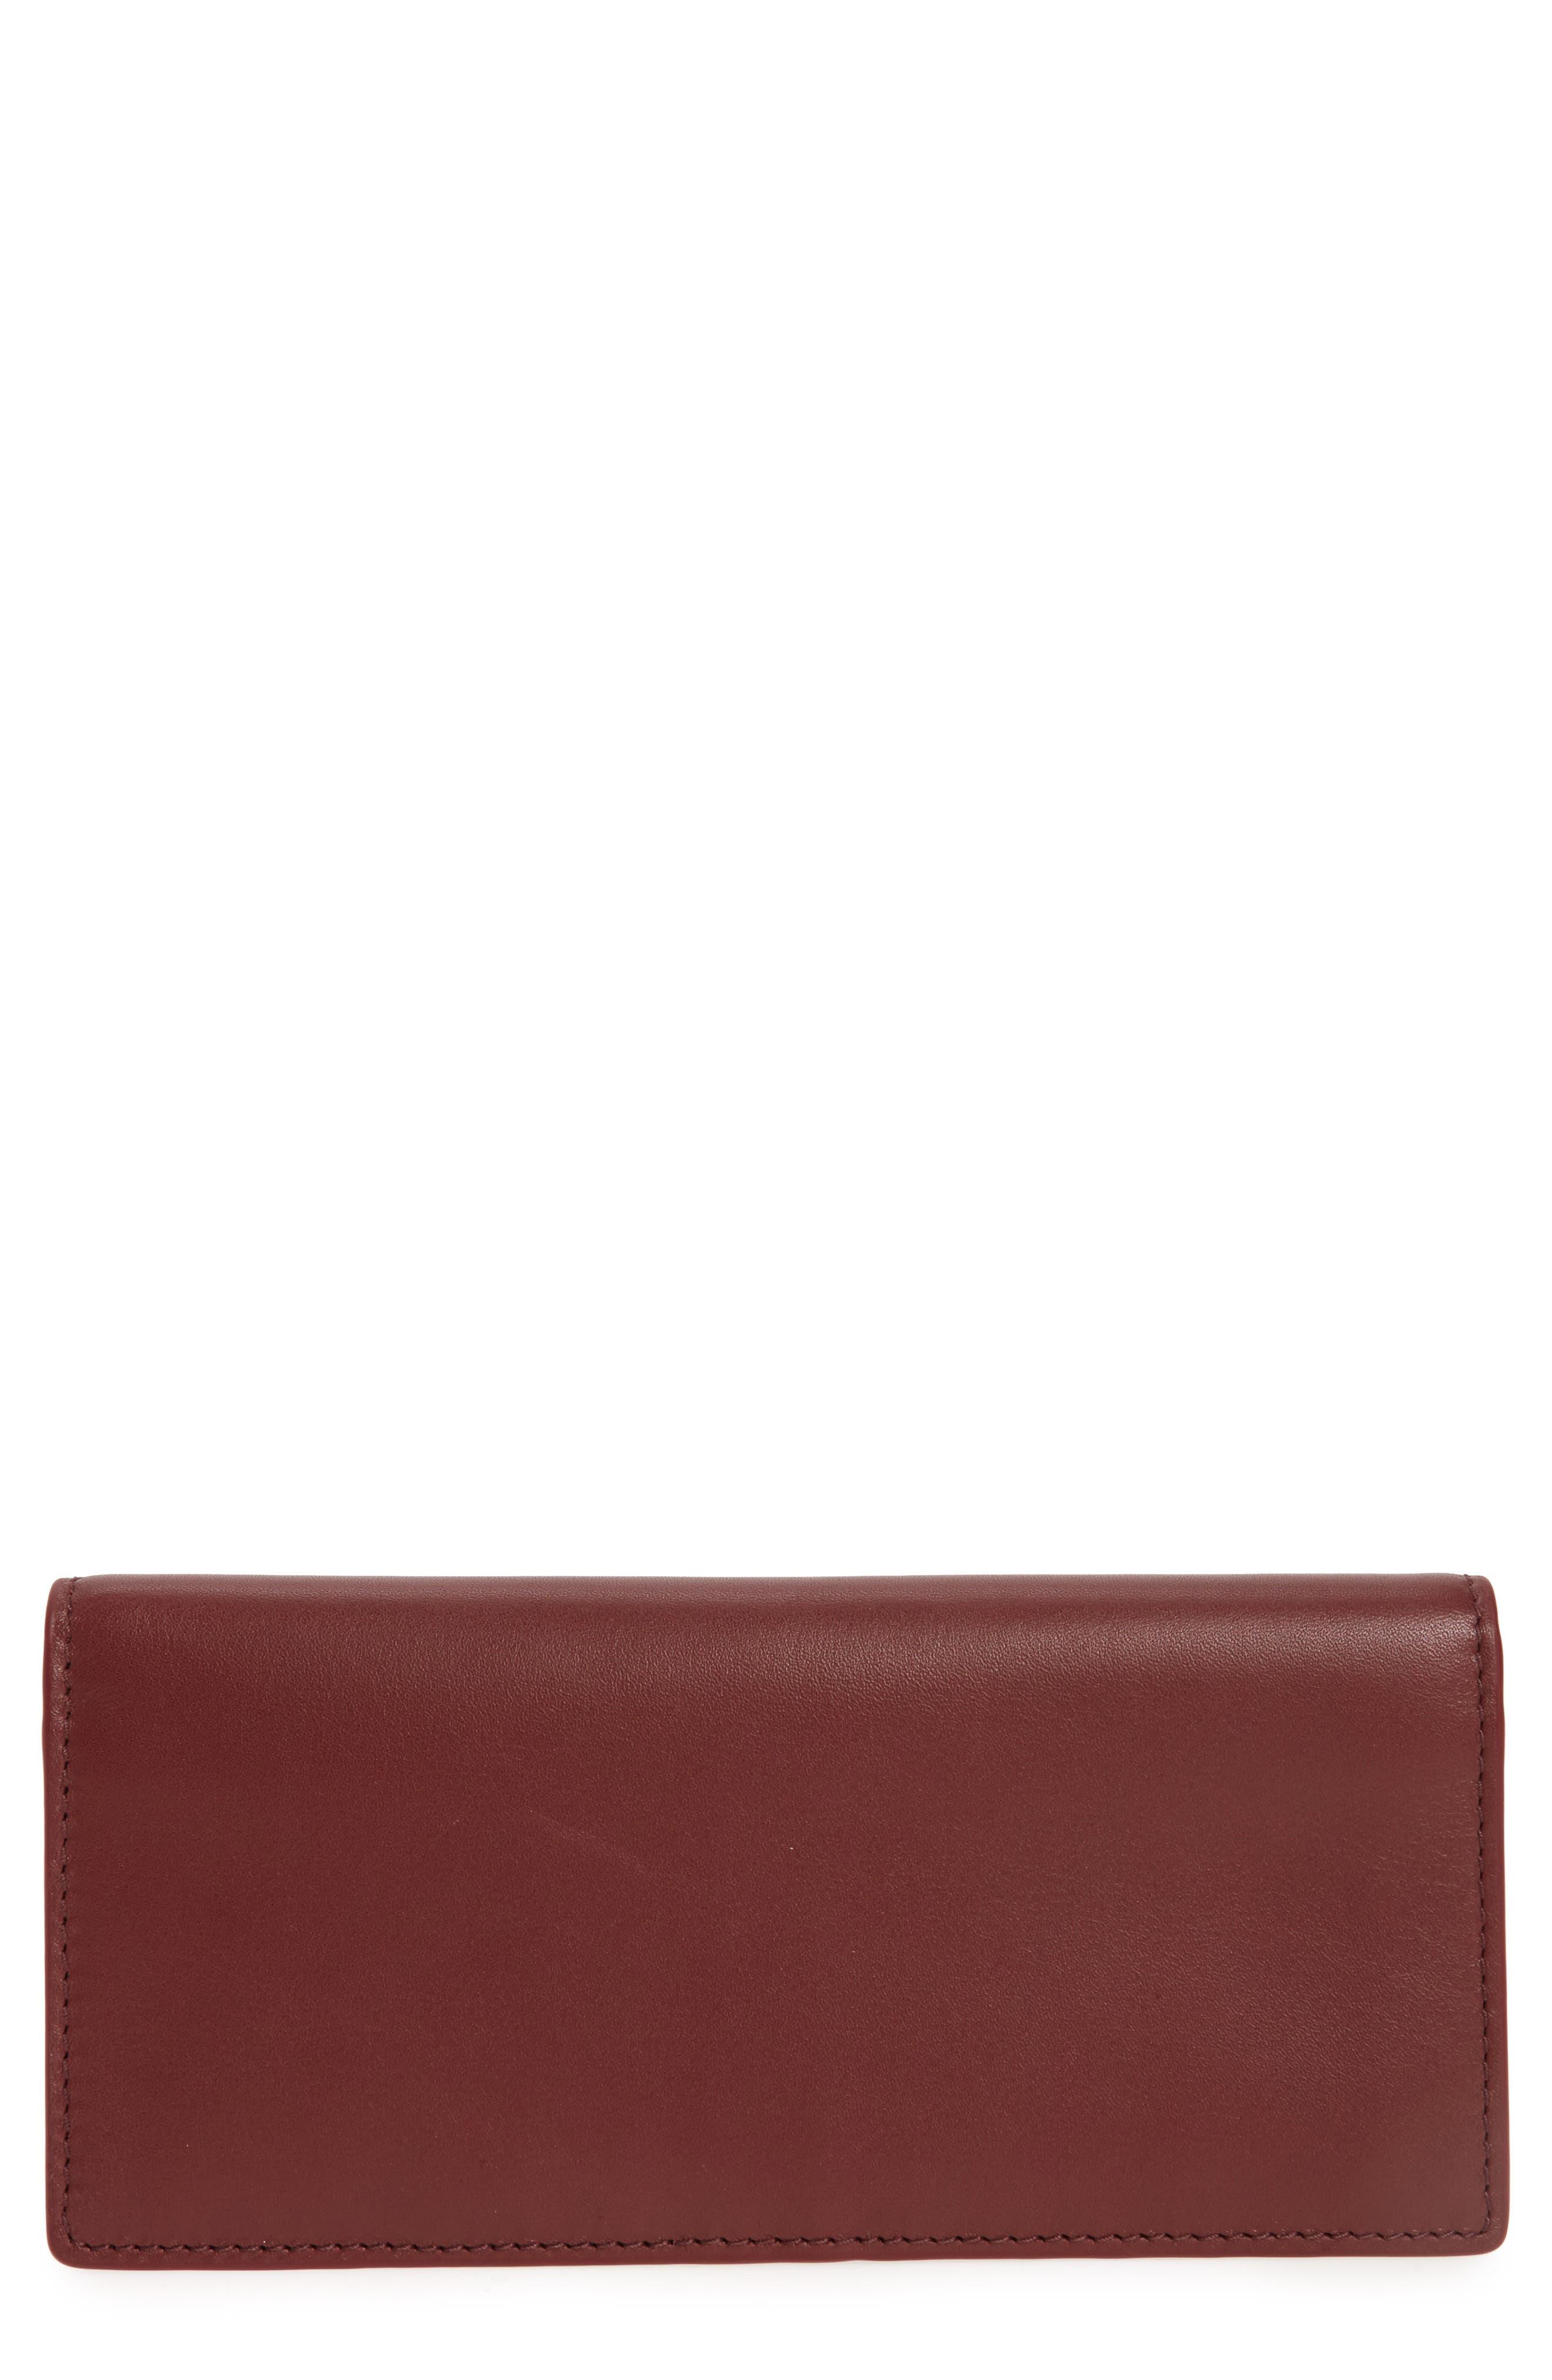 Main Image - Skagen Slim Vertical Leather Wallet